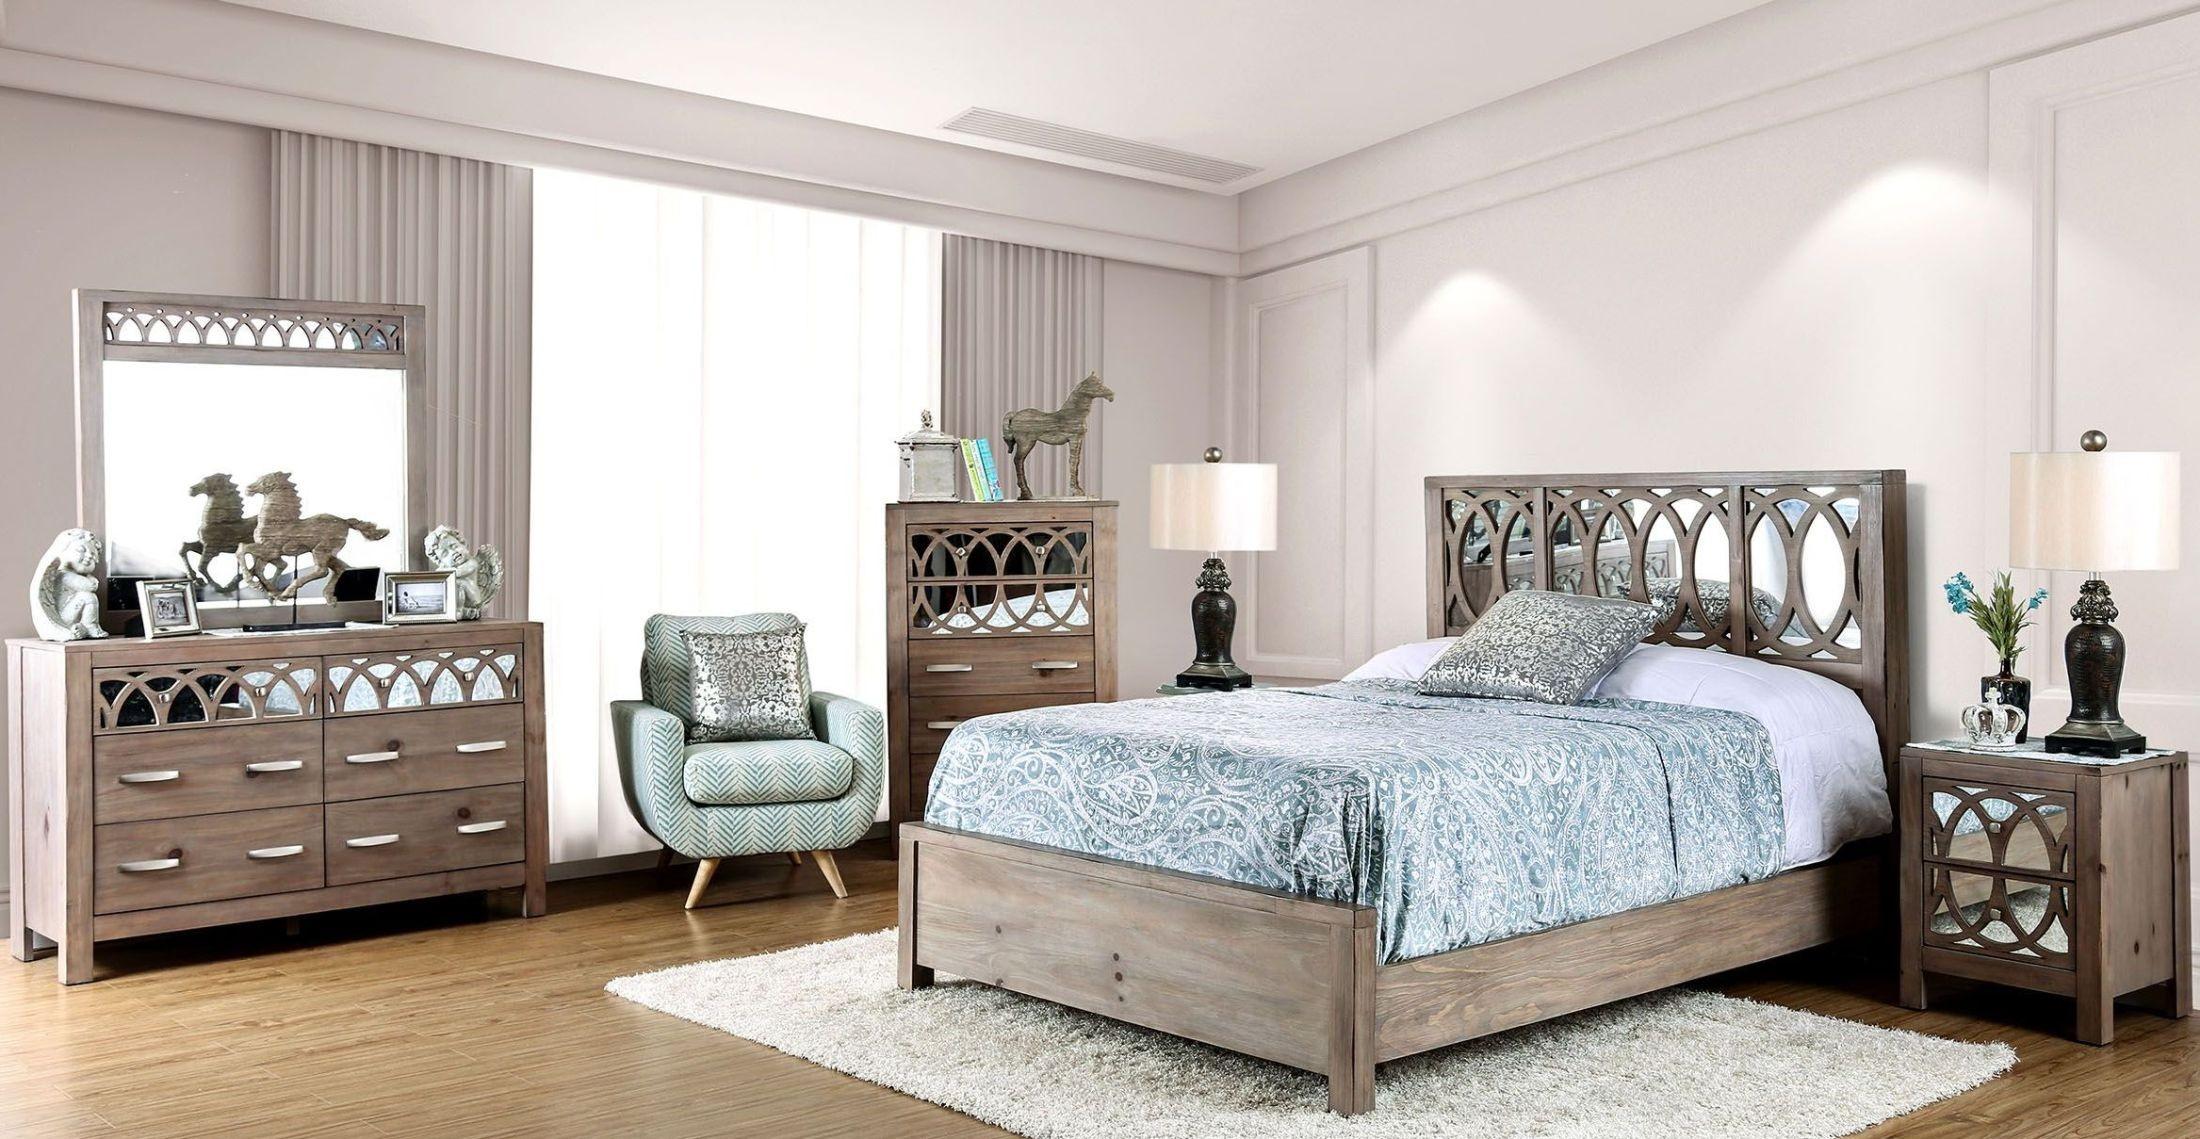 Zaragoza rustic natural tone panel bedroom set from